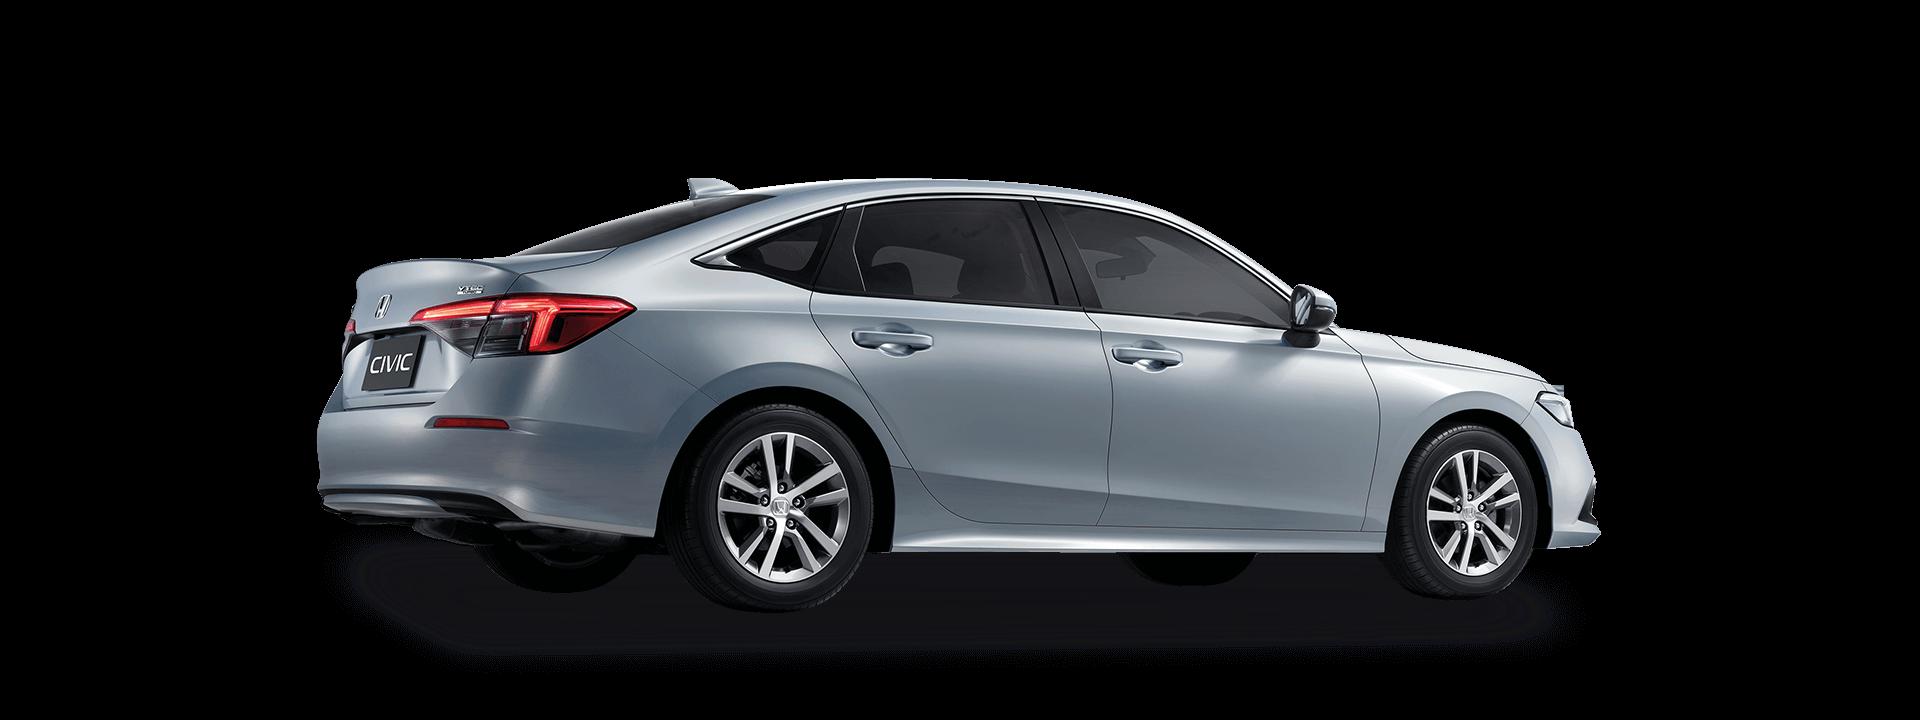 2. Honda Civic 2022 รุ่น EL+ ราคา 1,009,900 บาท